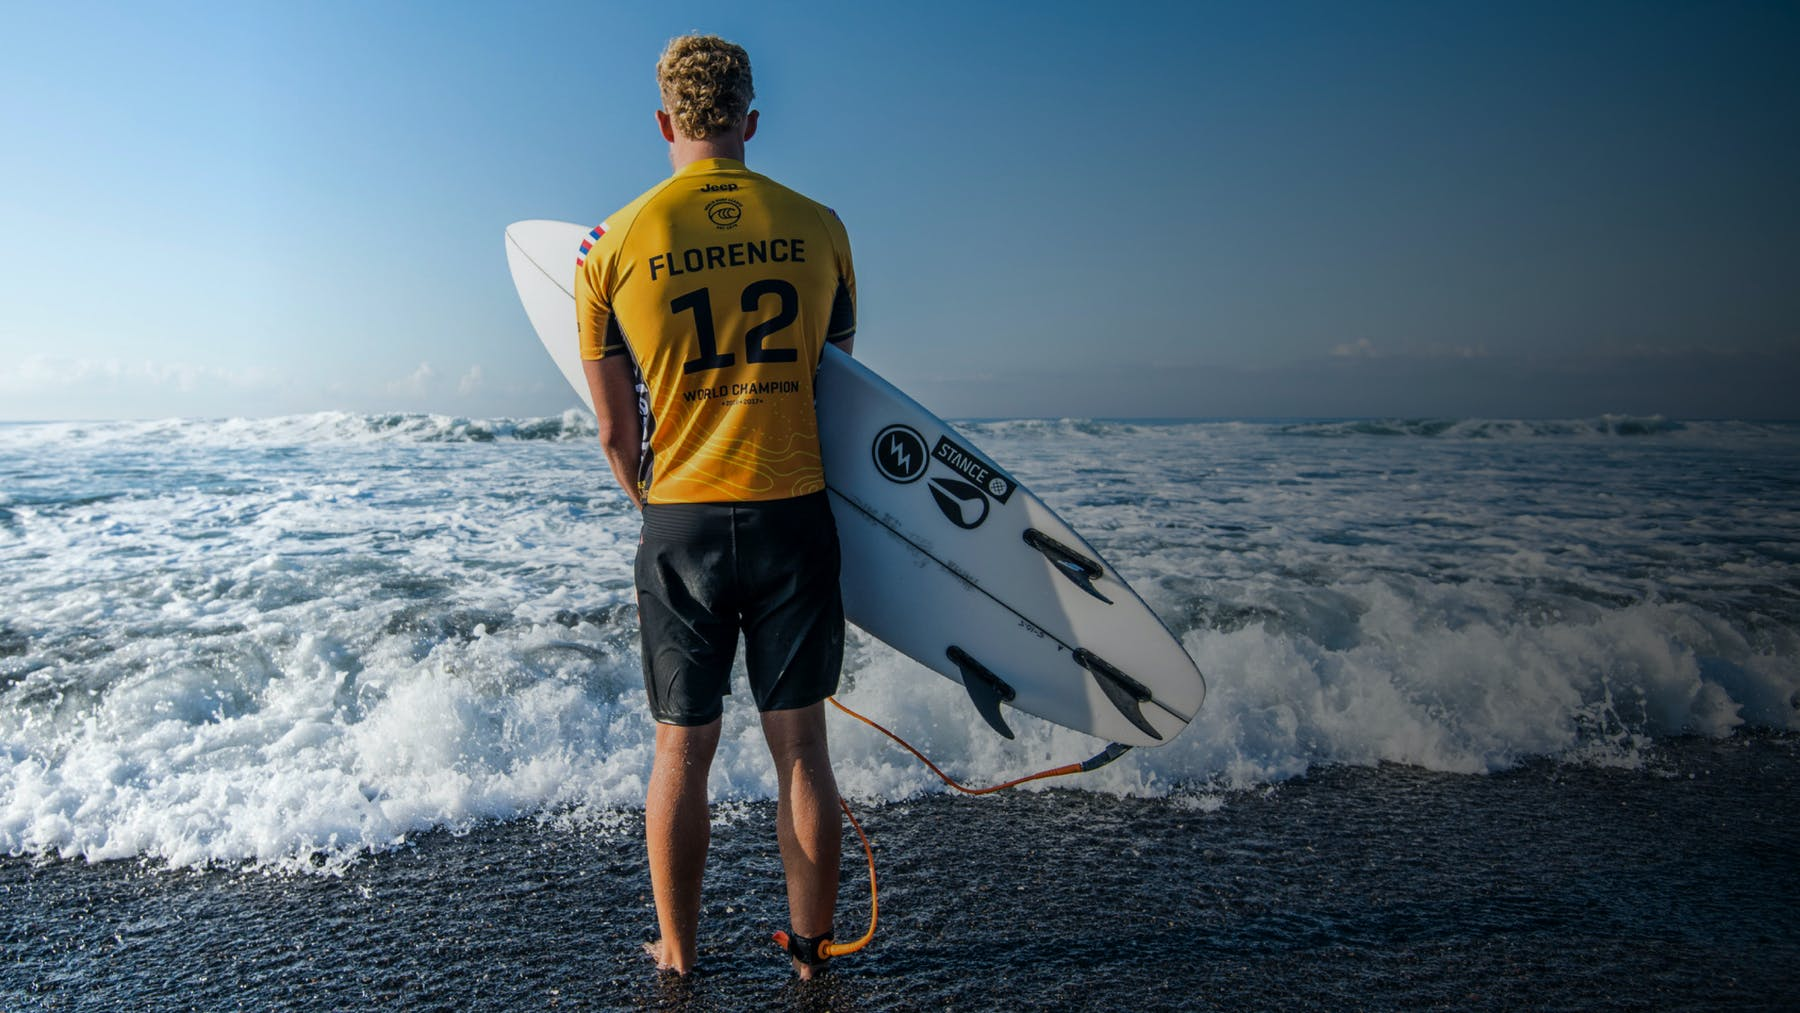 02 Surfing Before Desktop